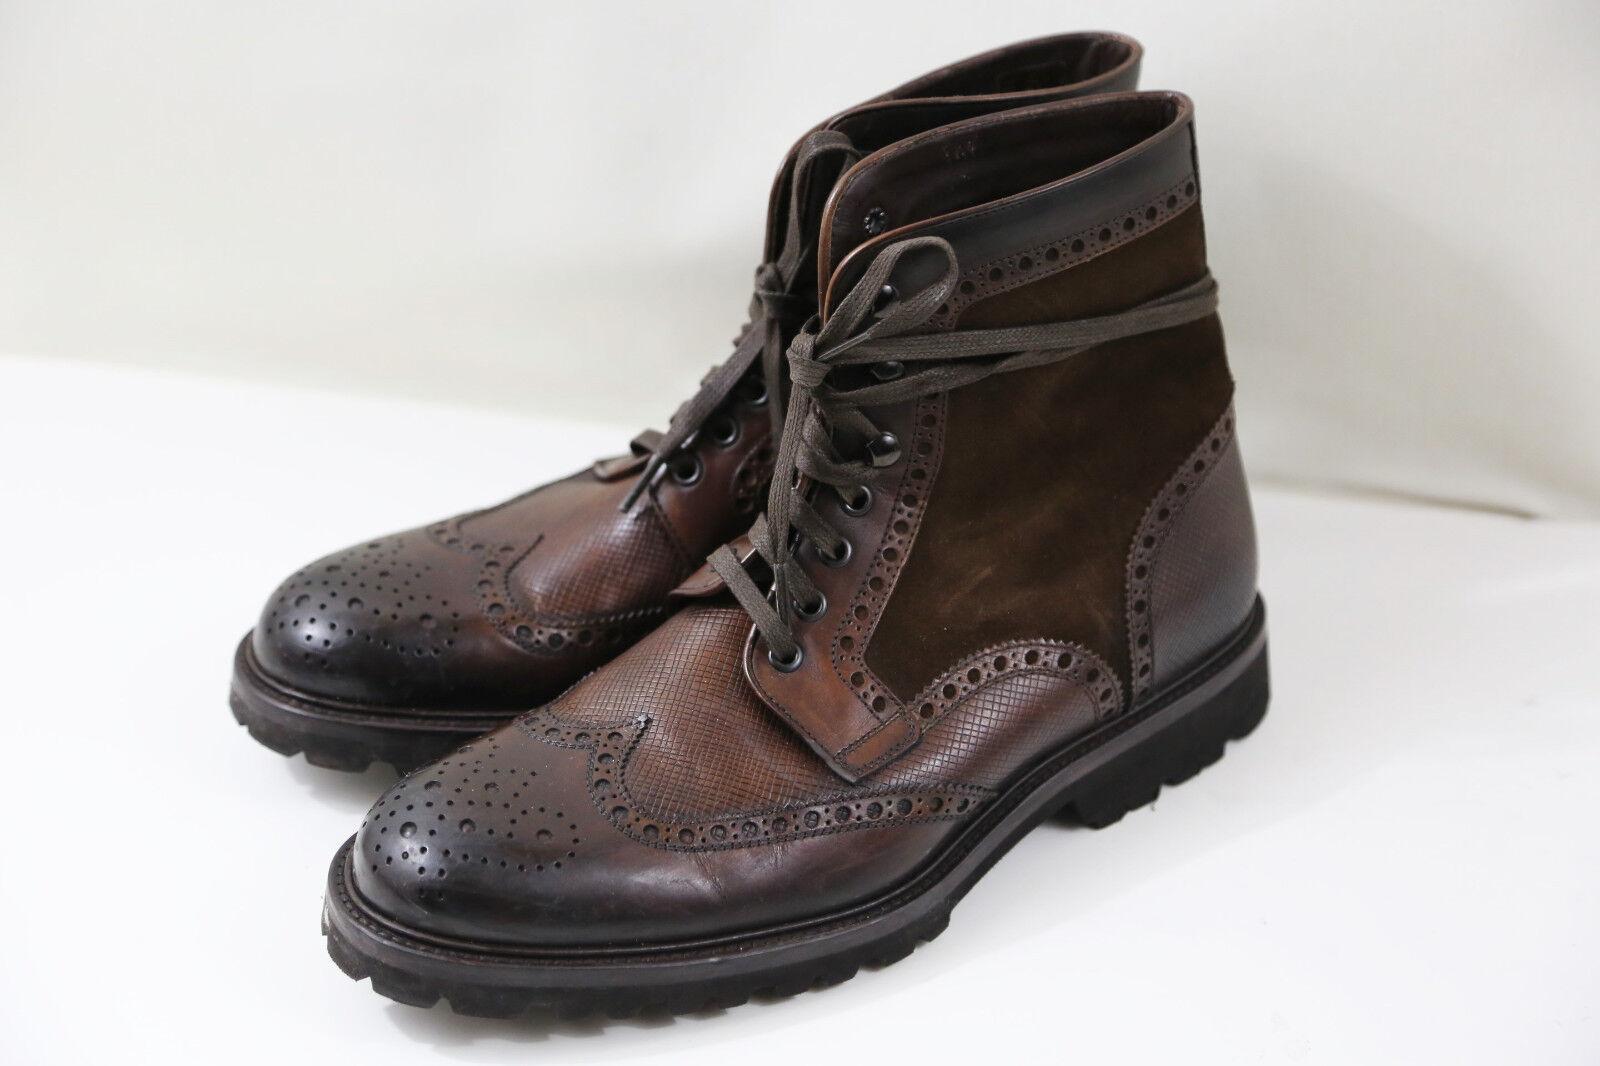 88 Magnanni Enzo Wingtip Boots Size 9 M   RETAIL  399